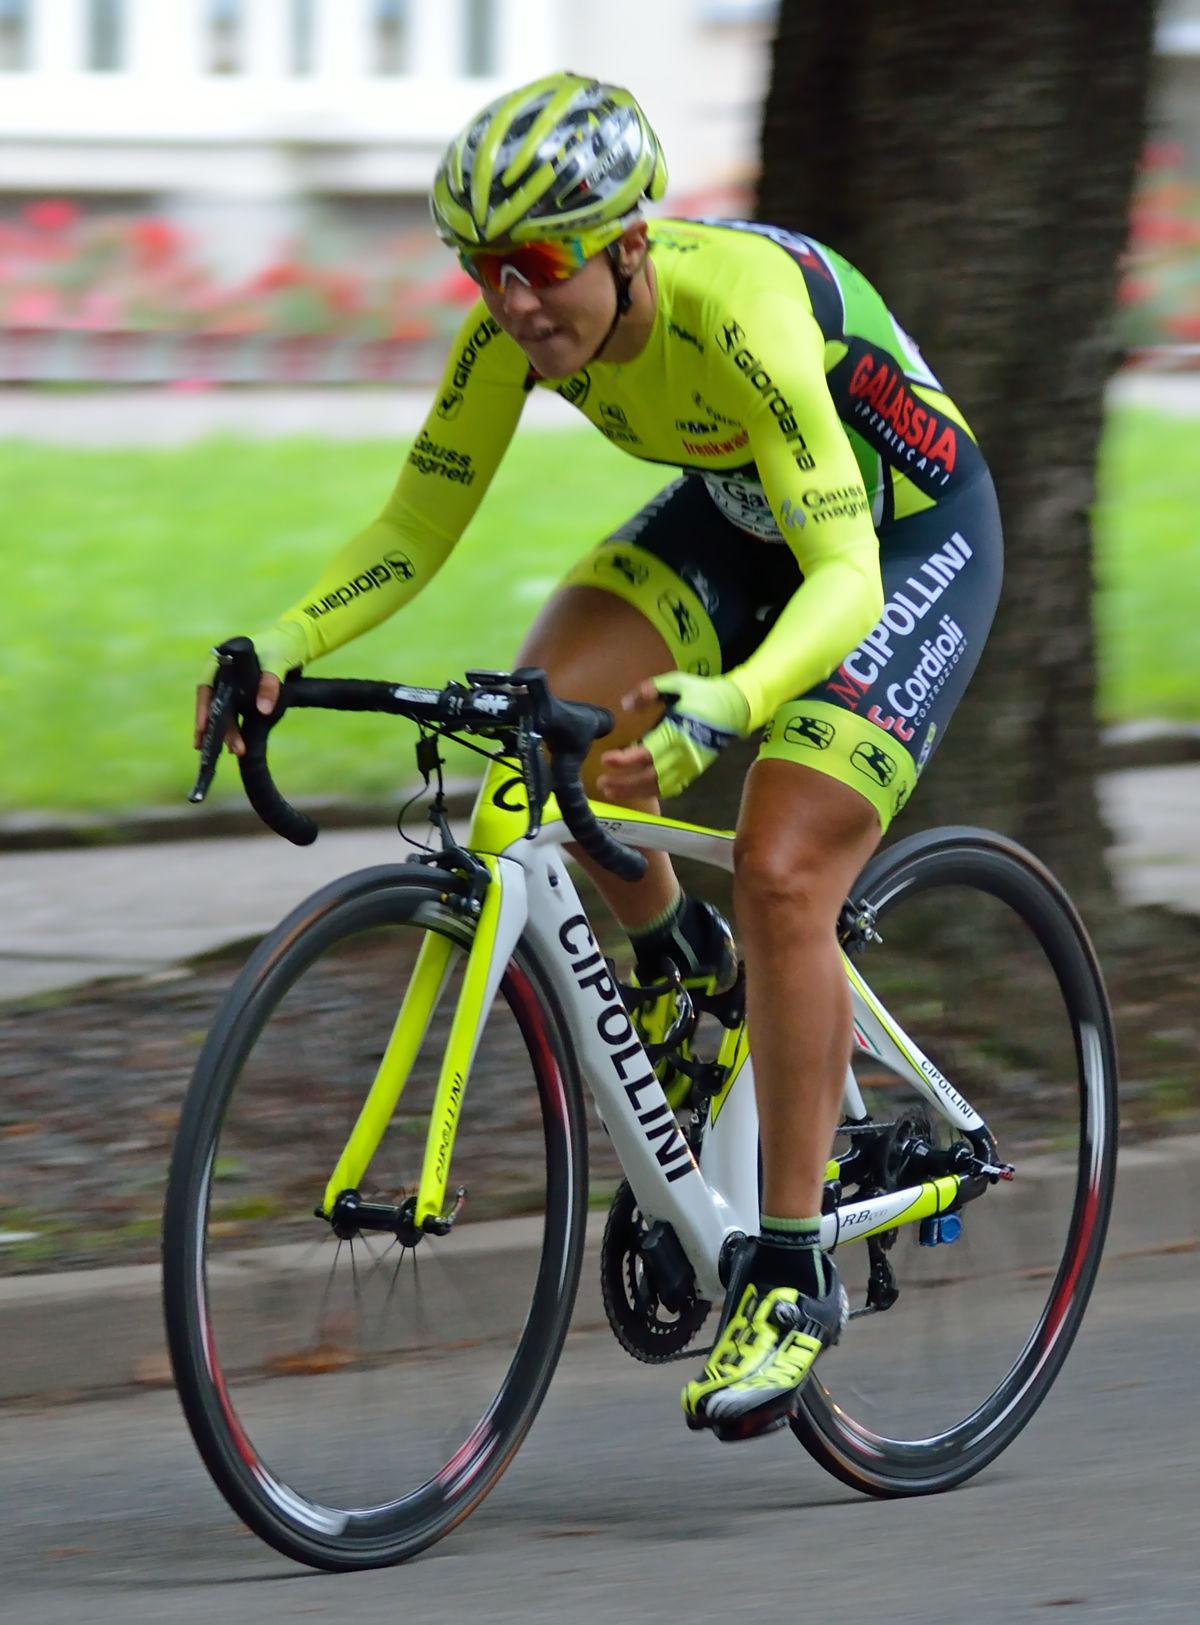 Photo of Marta Tagliaferro: Italian racing cyclist